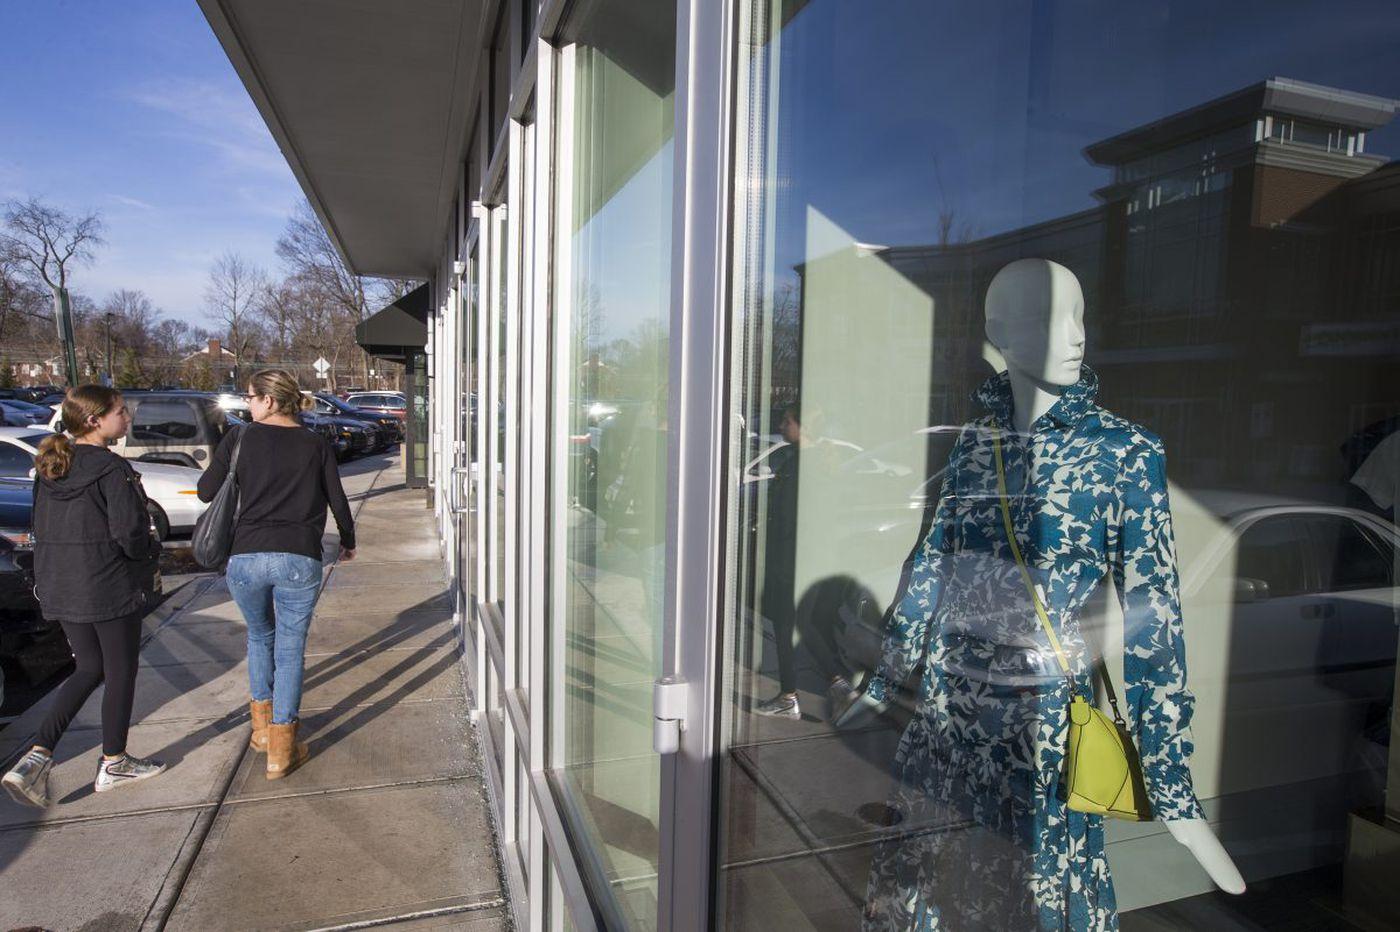 How Bryn Mawr Village found its Main Line shopping niche